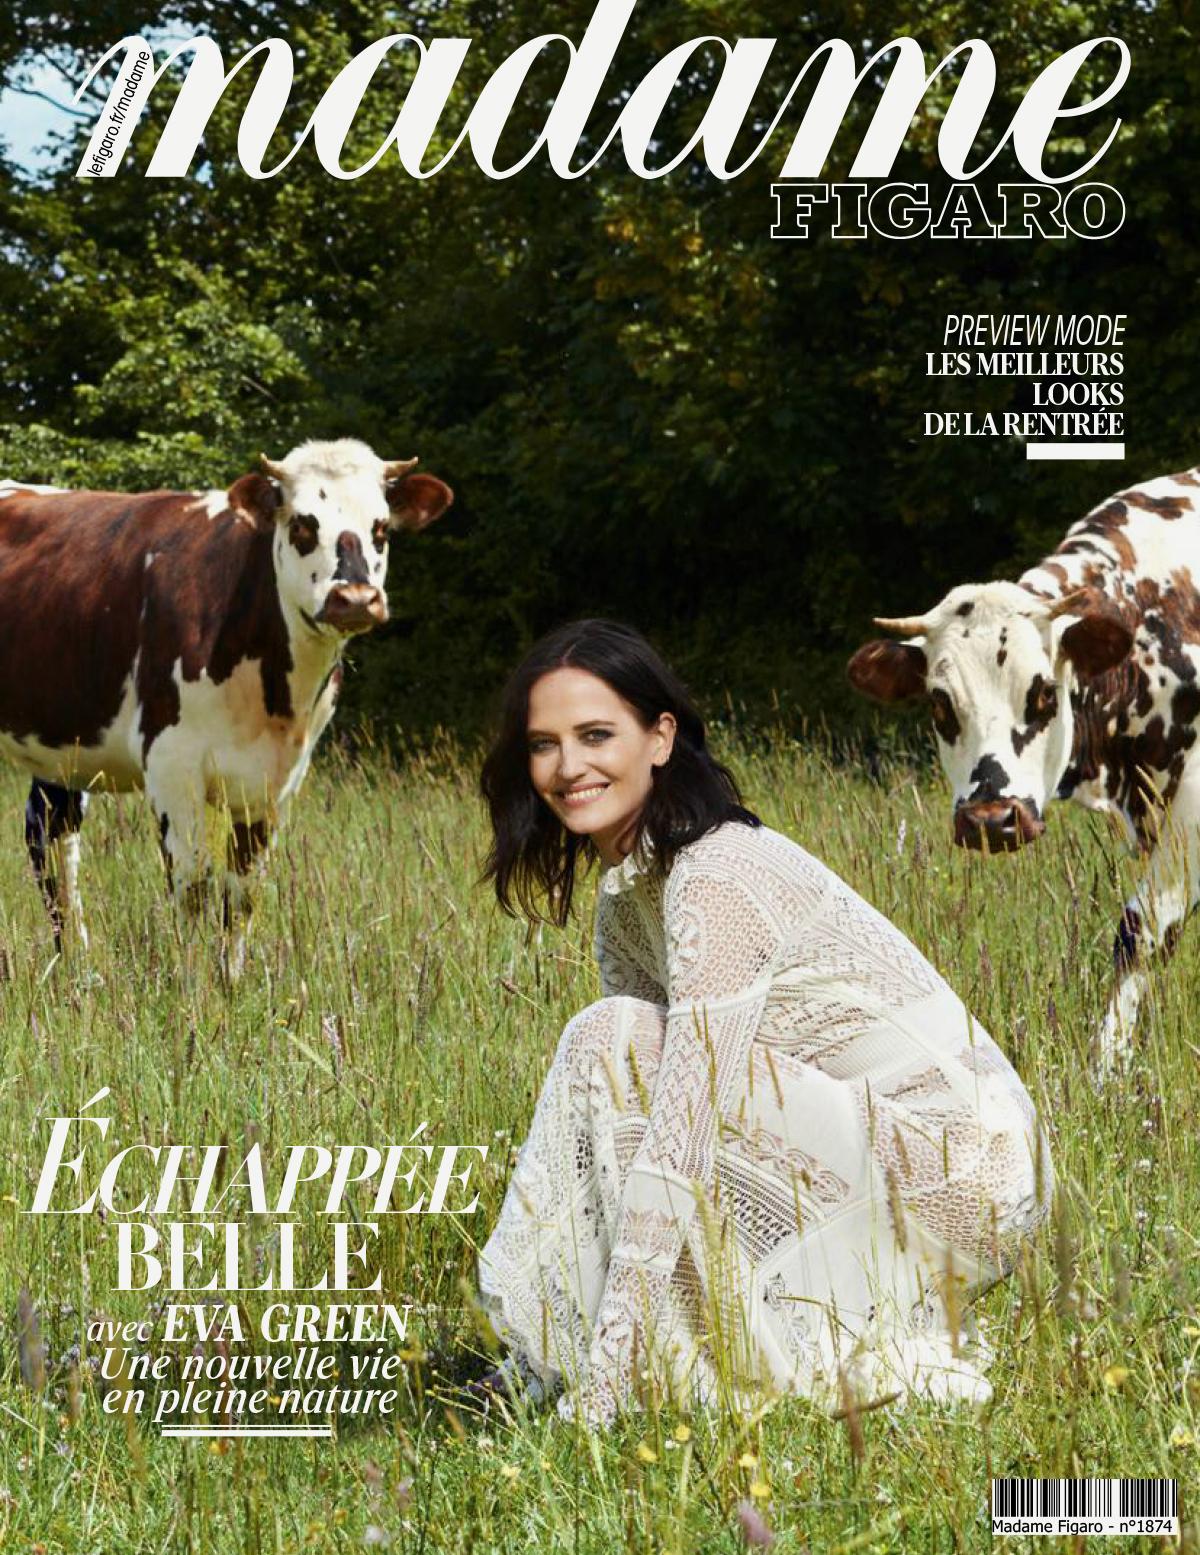 Eva Green covers Madame Figaro July 24th, 2020 by Dant Studio / H&K